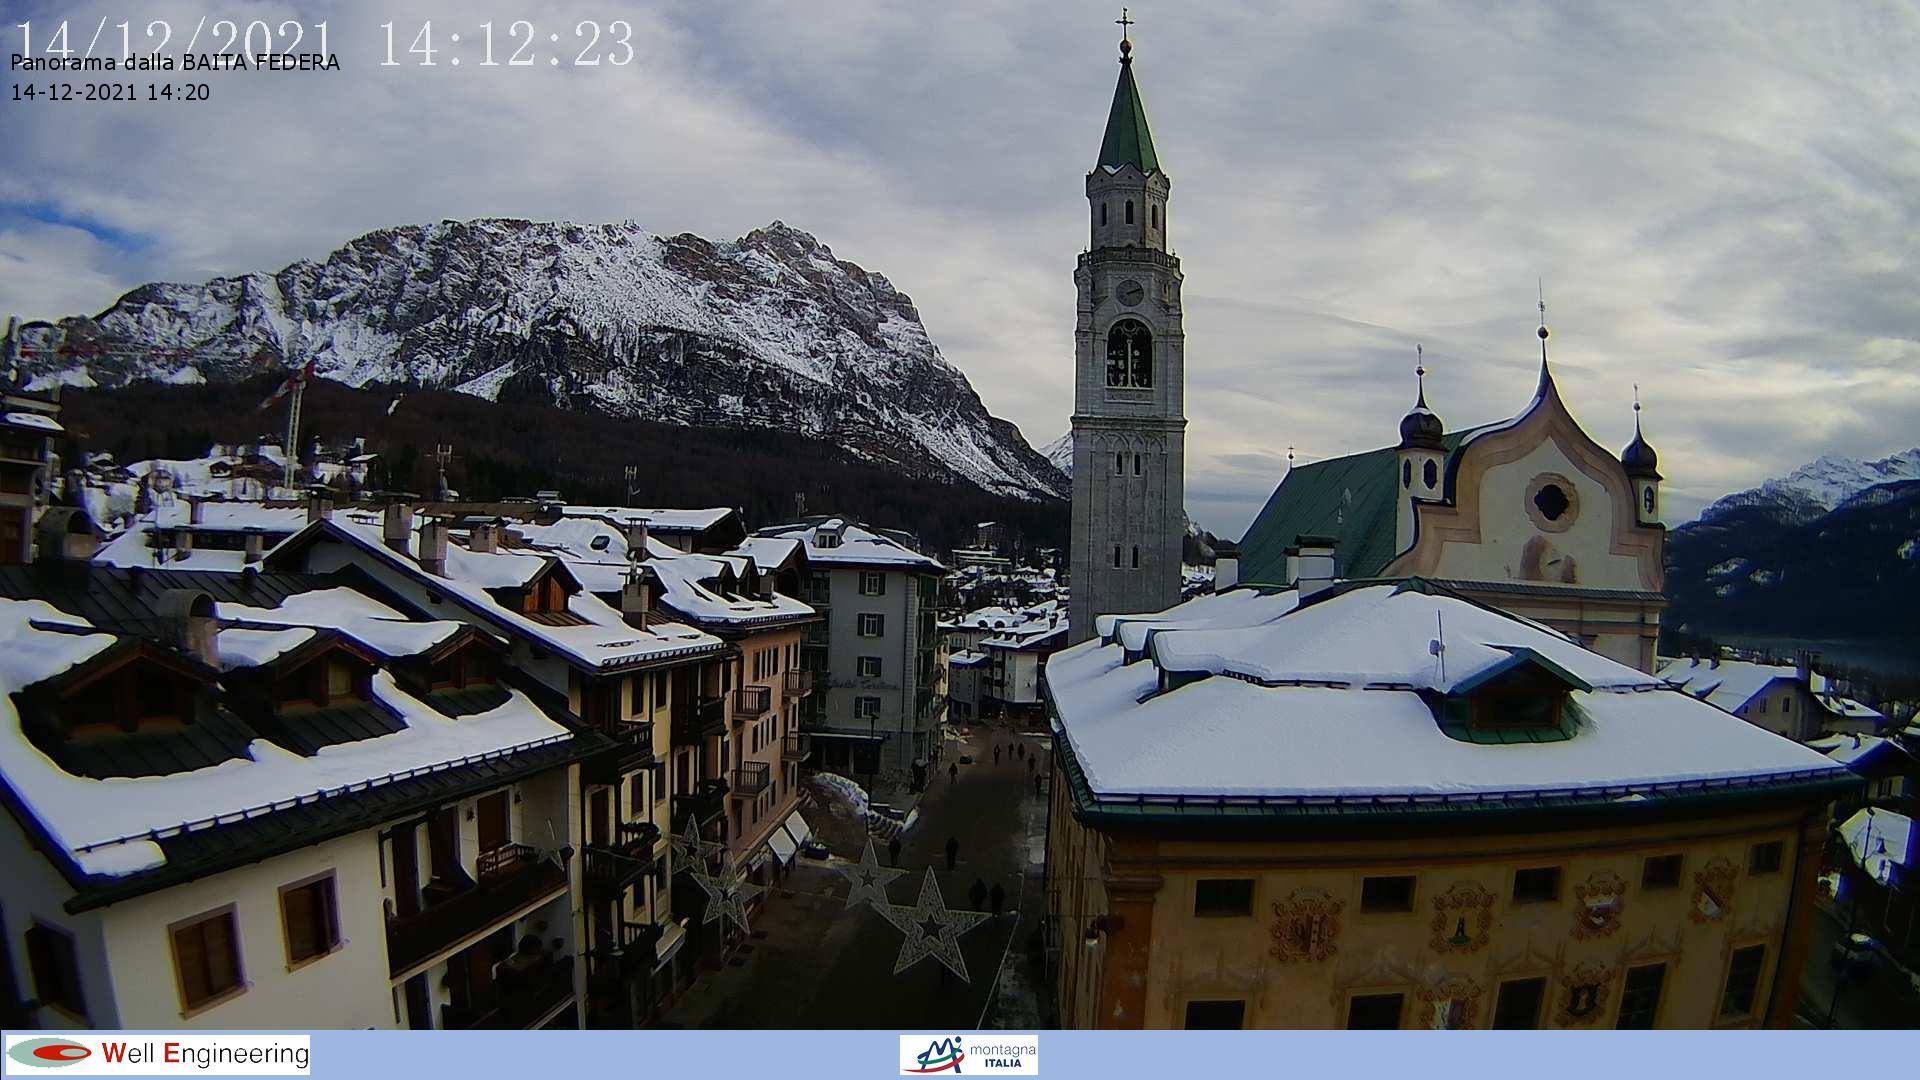 Webcam Cortina Malga Federa